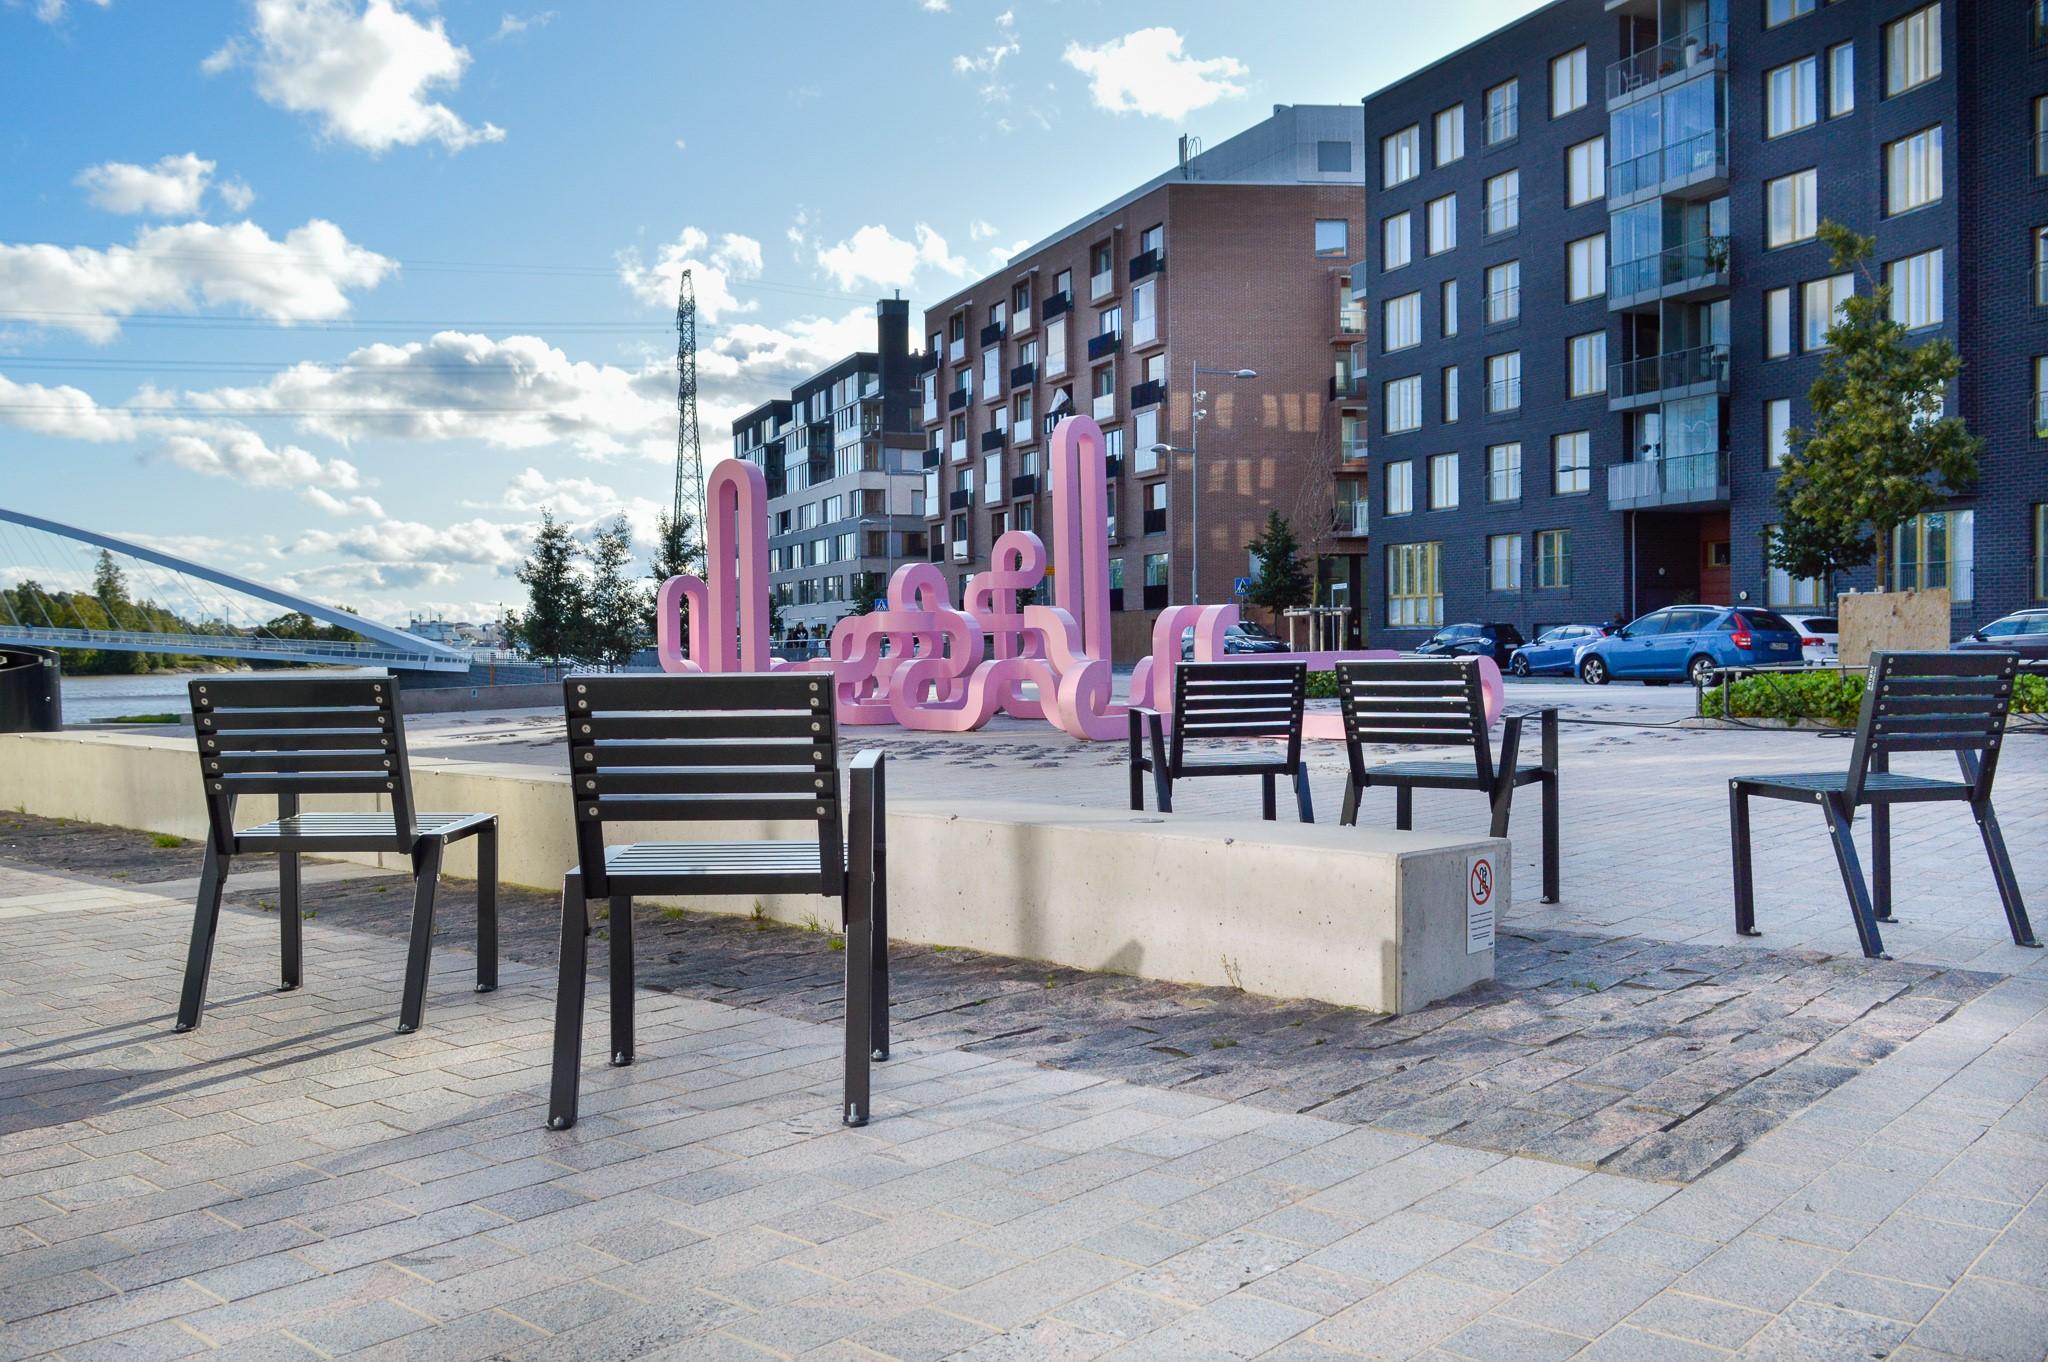 Helsingi linn